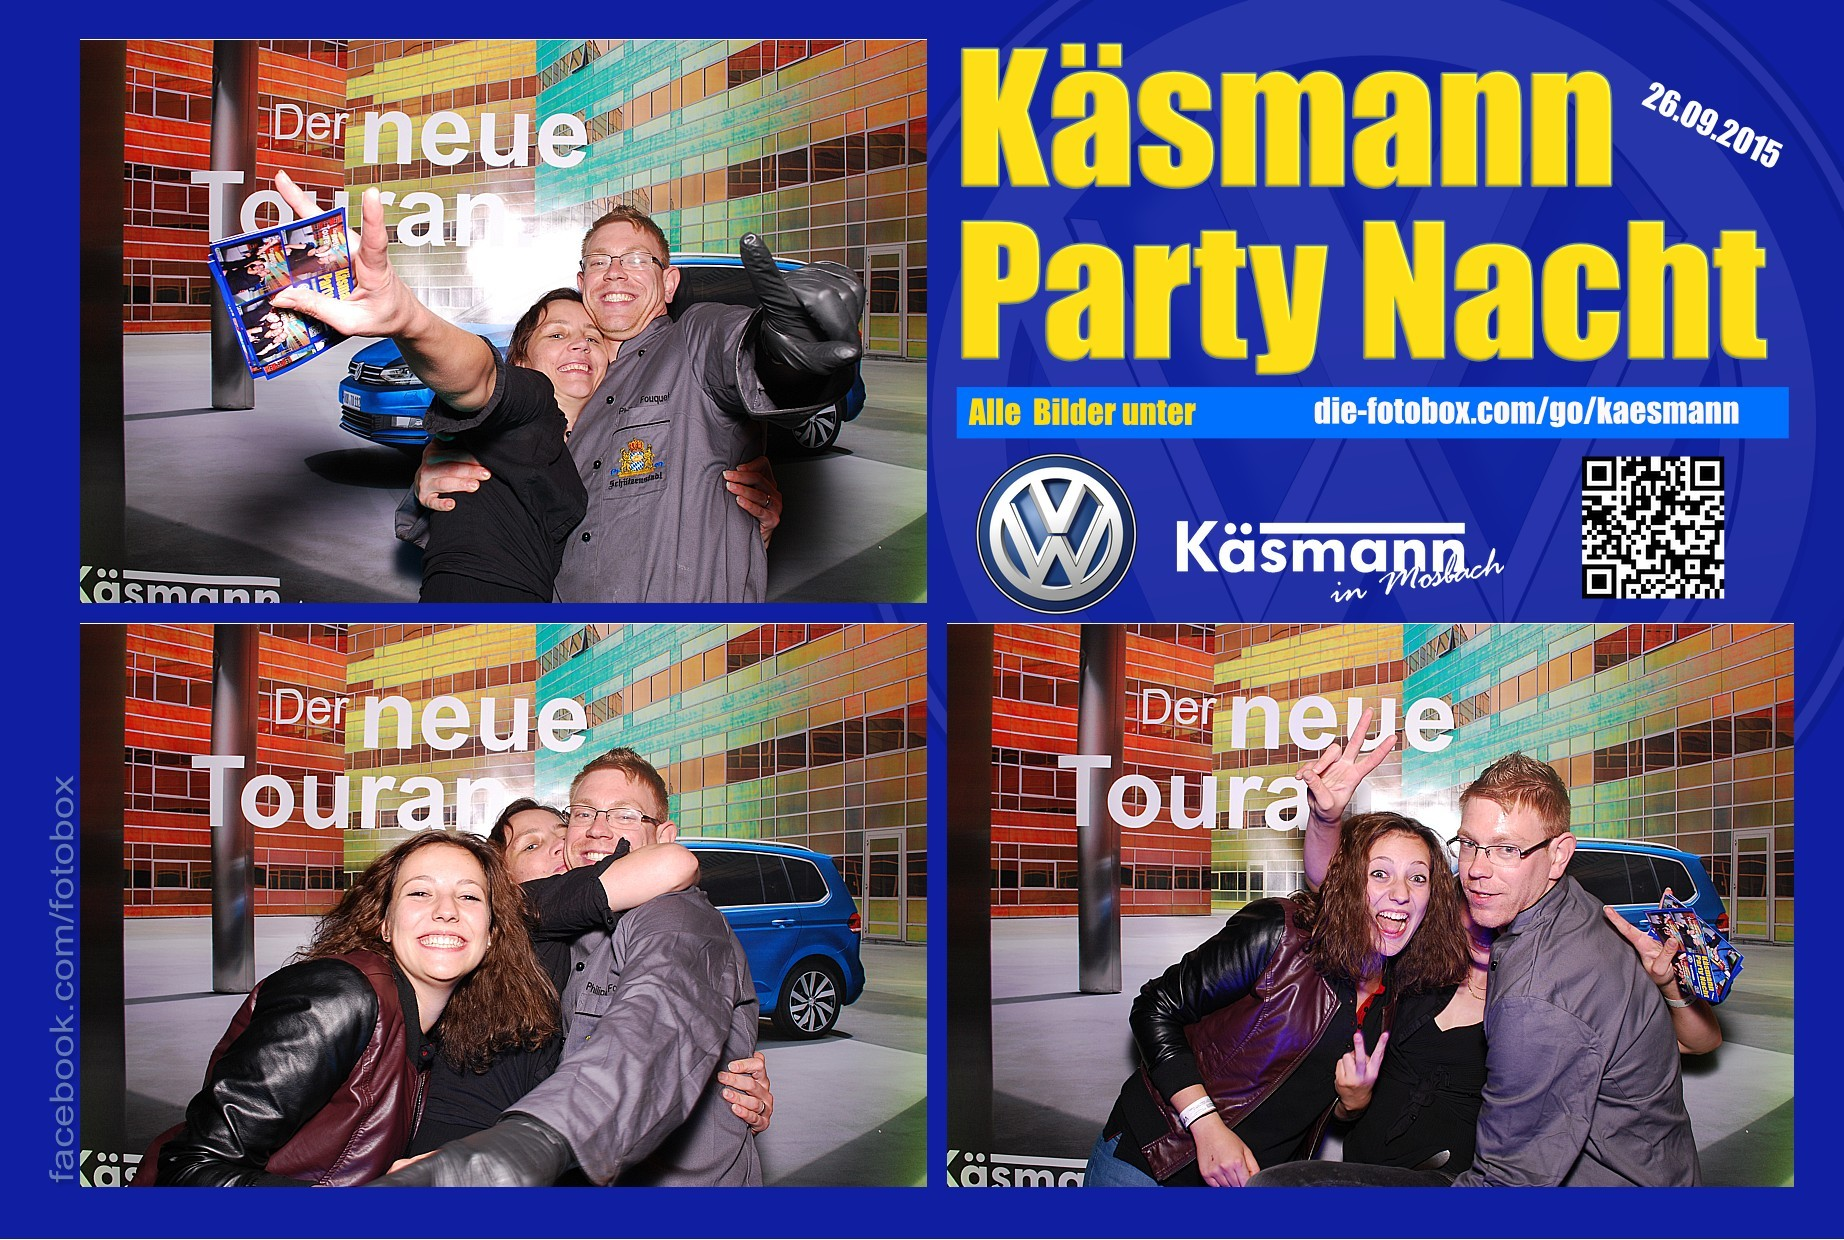 Käsmannparty 2015 - www.die-fotobox.com 01377